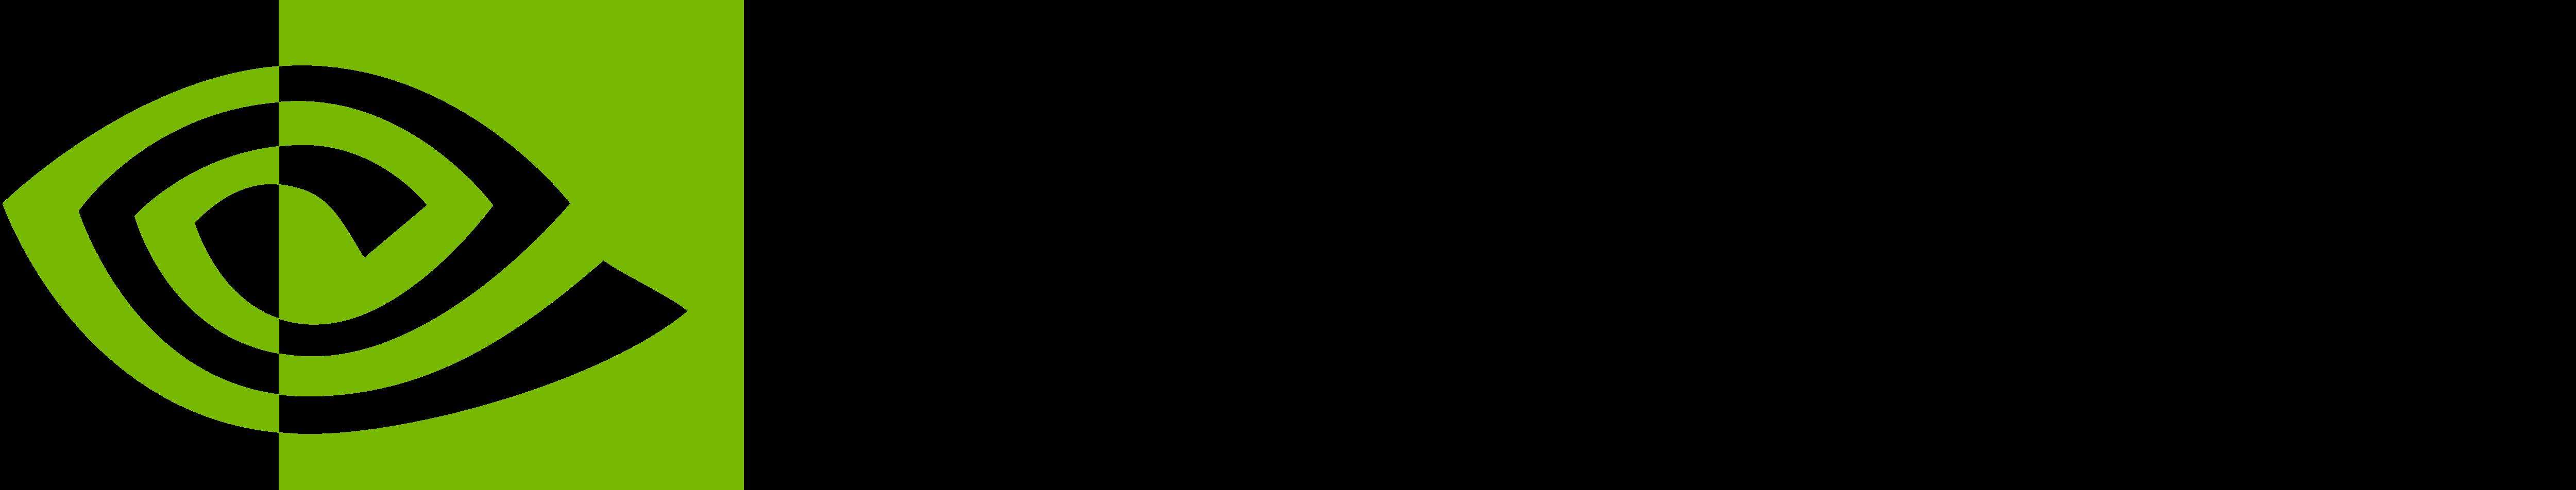 NVIDIA: Mellanox Logo